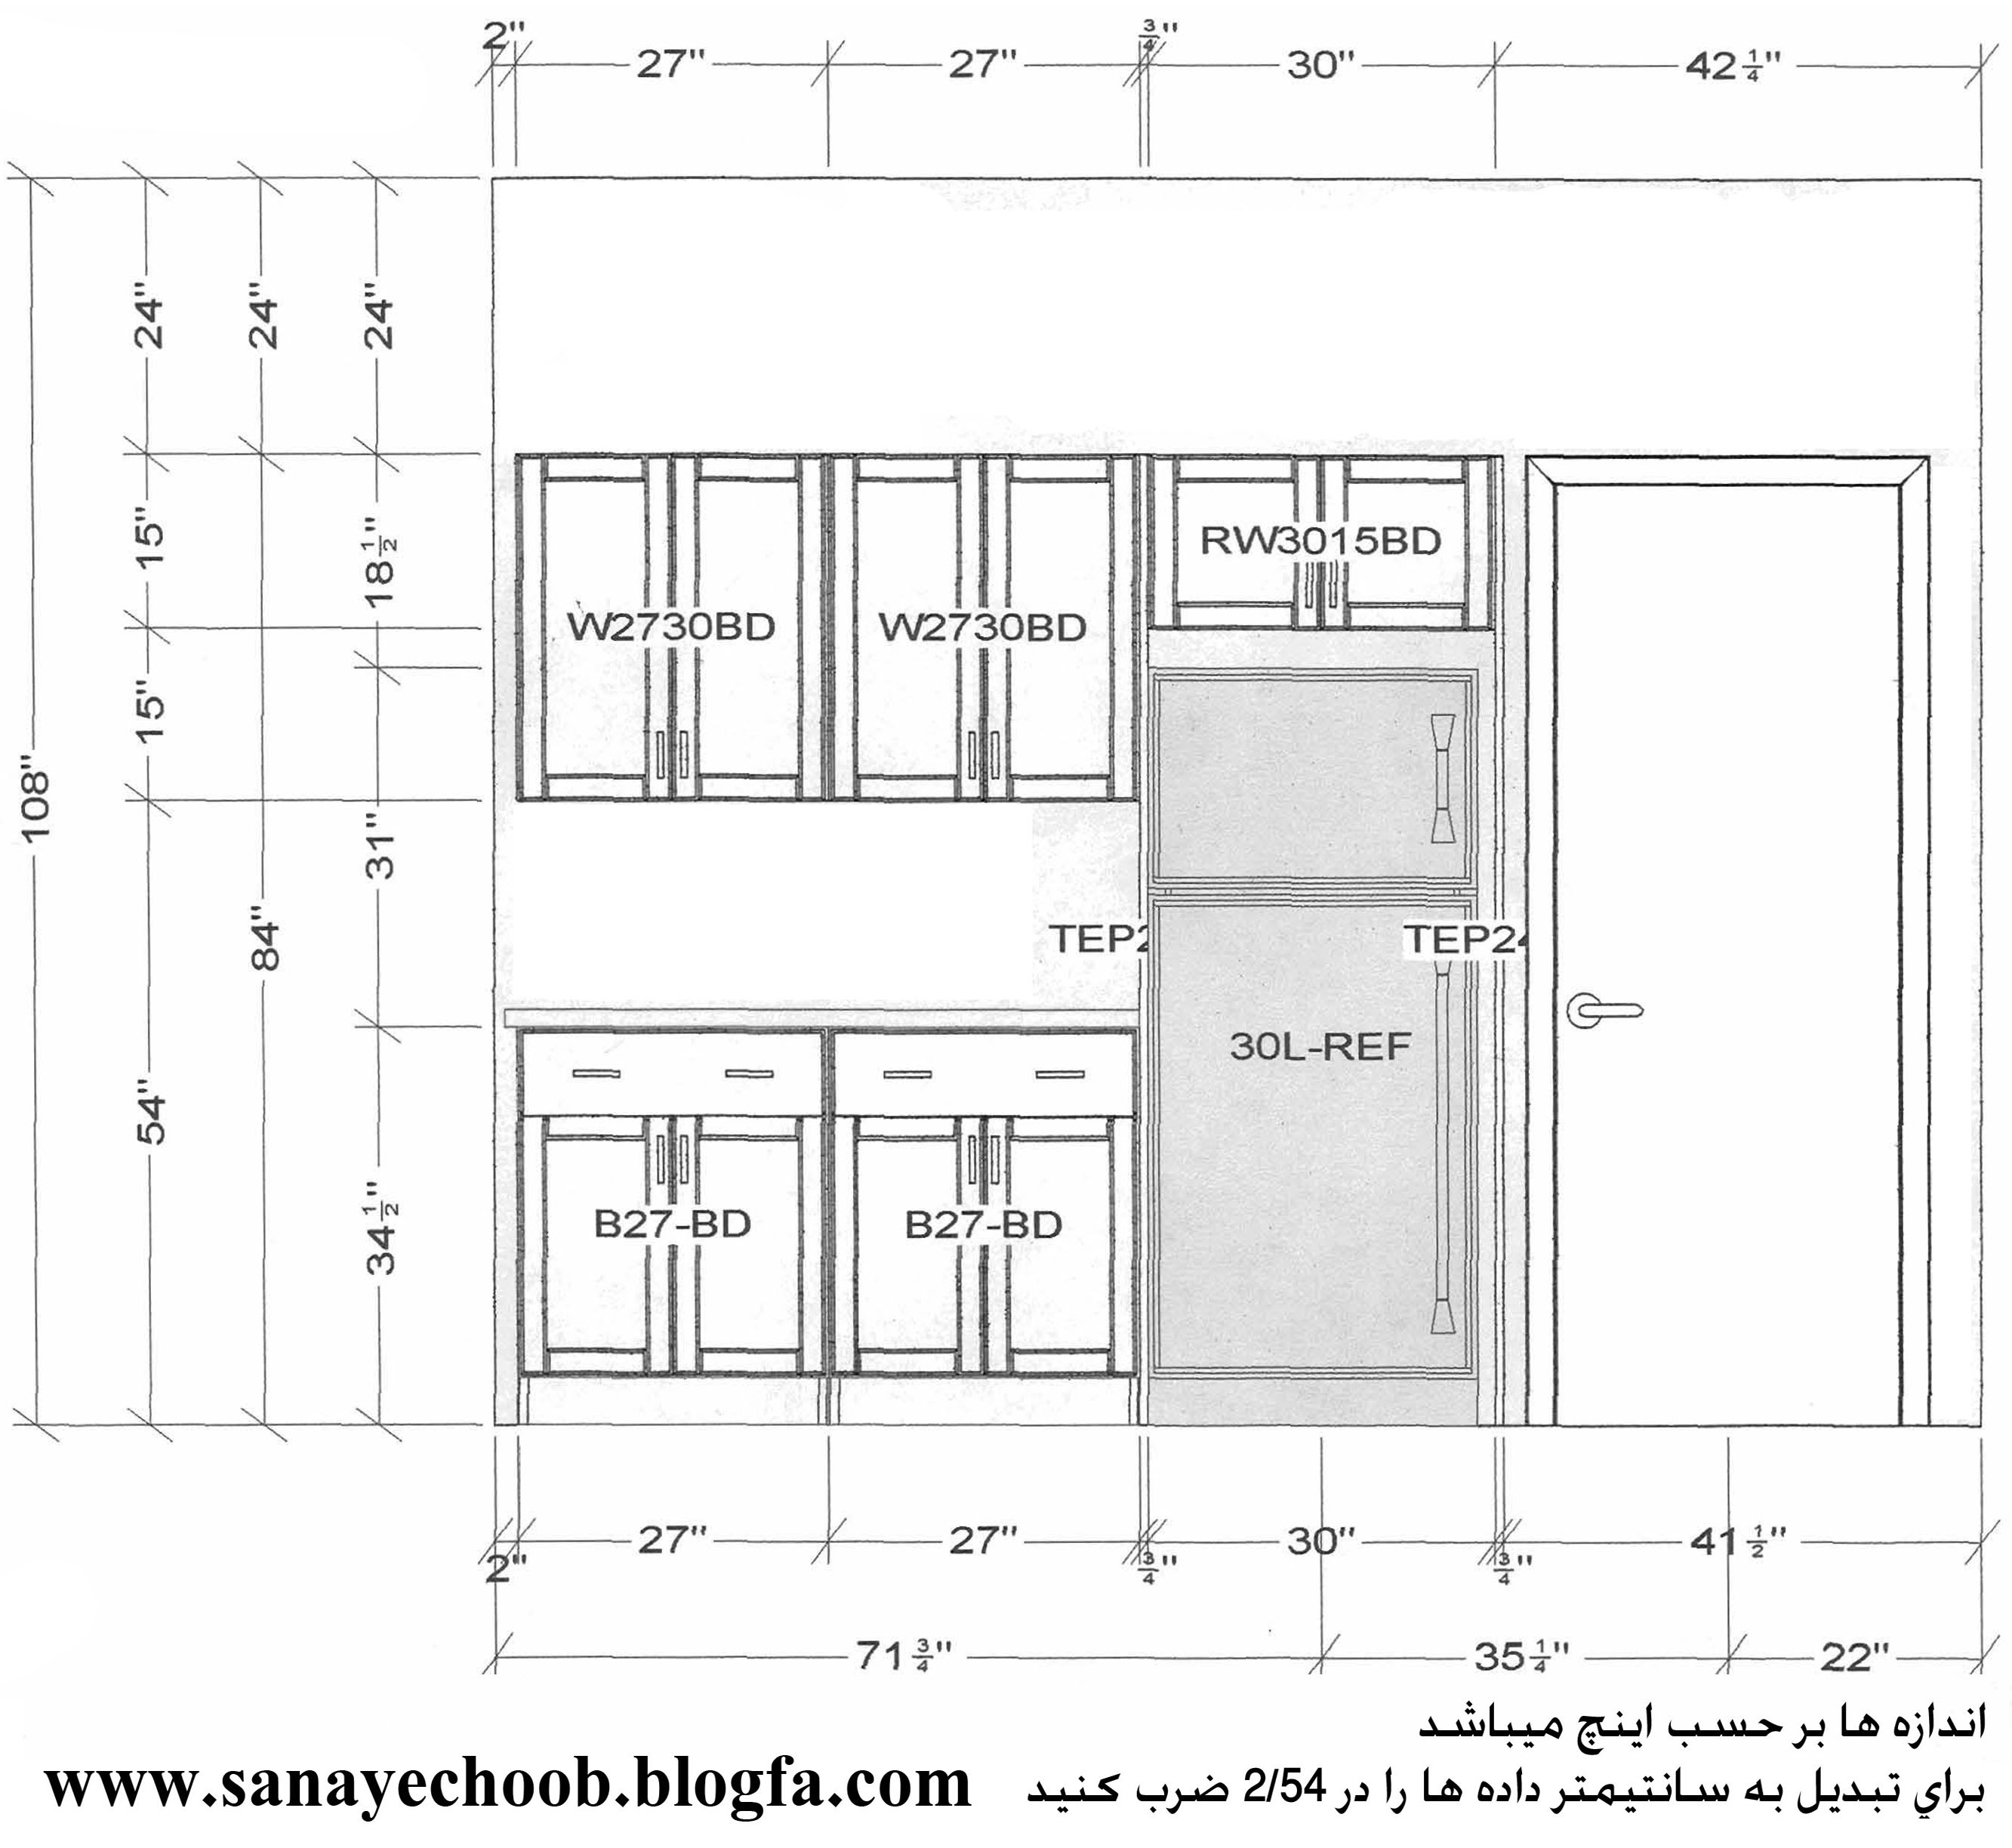 19 images standard kitchen cabinet dimensions